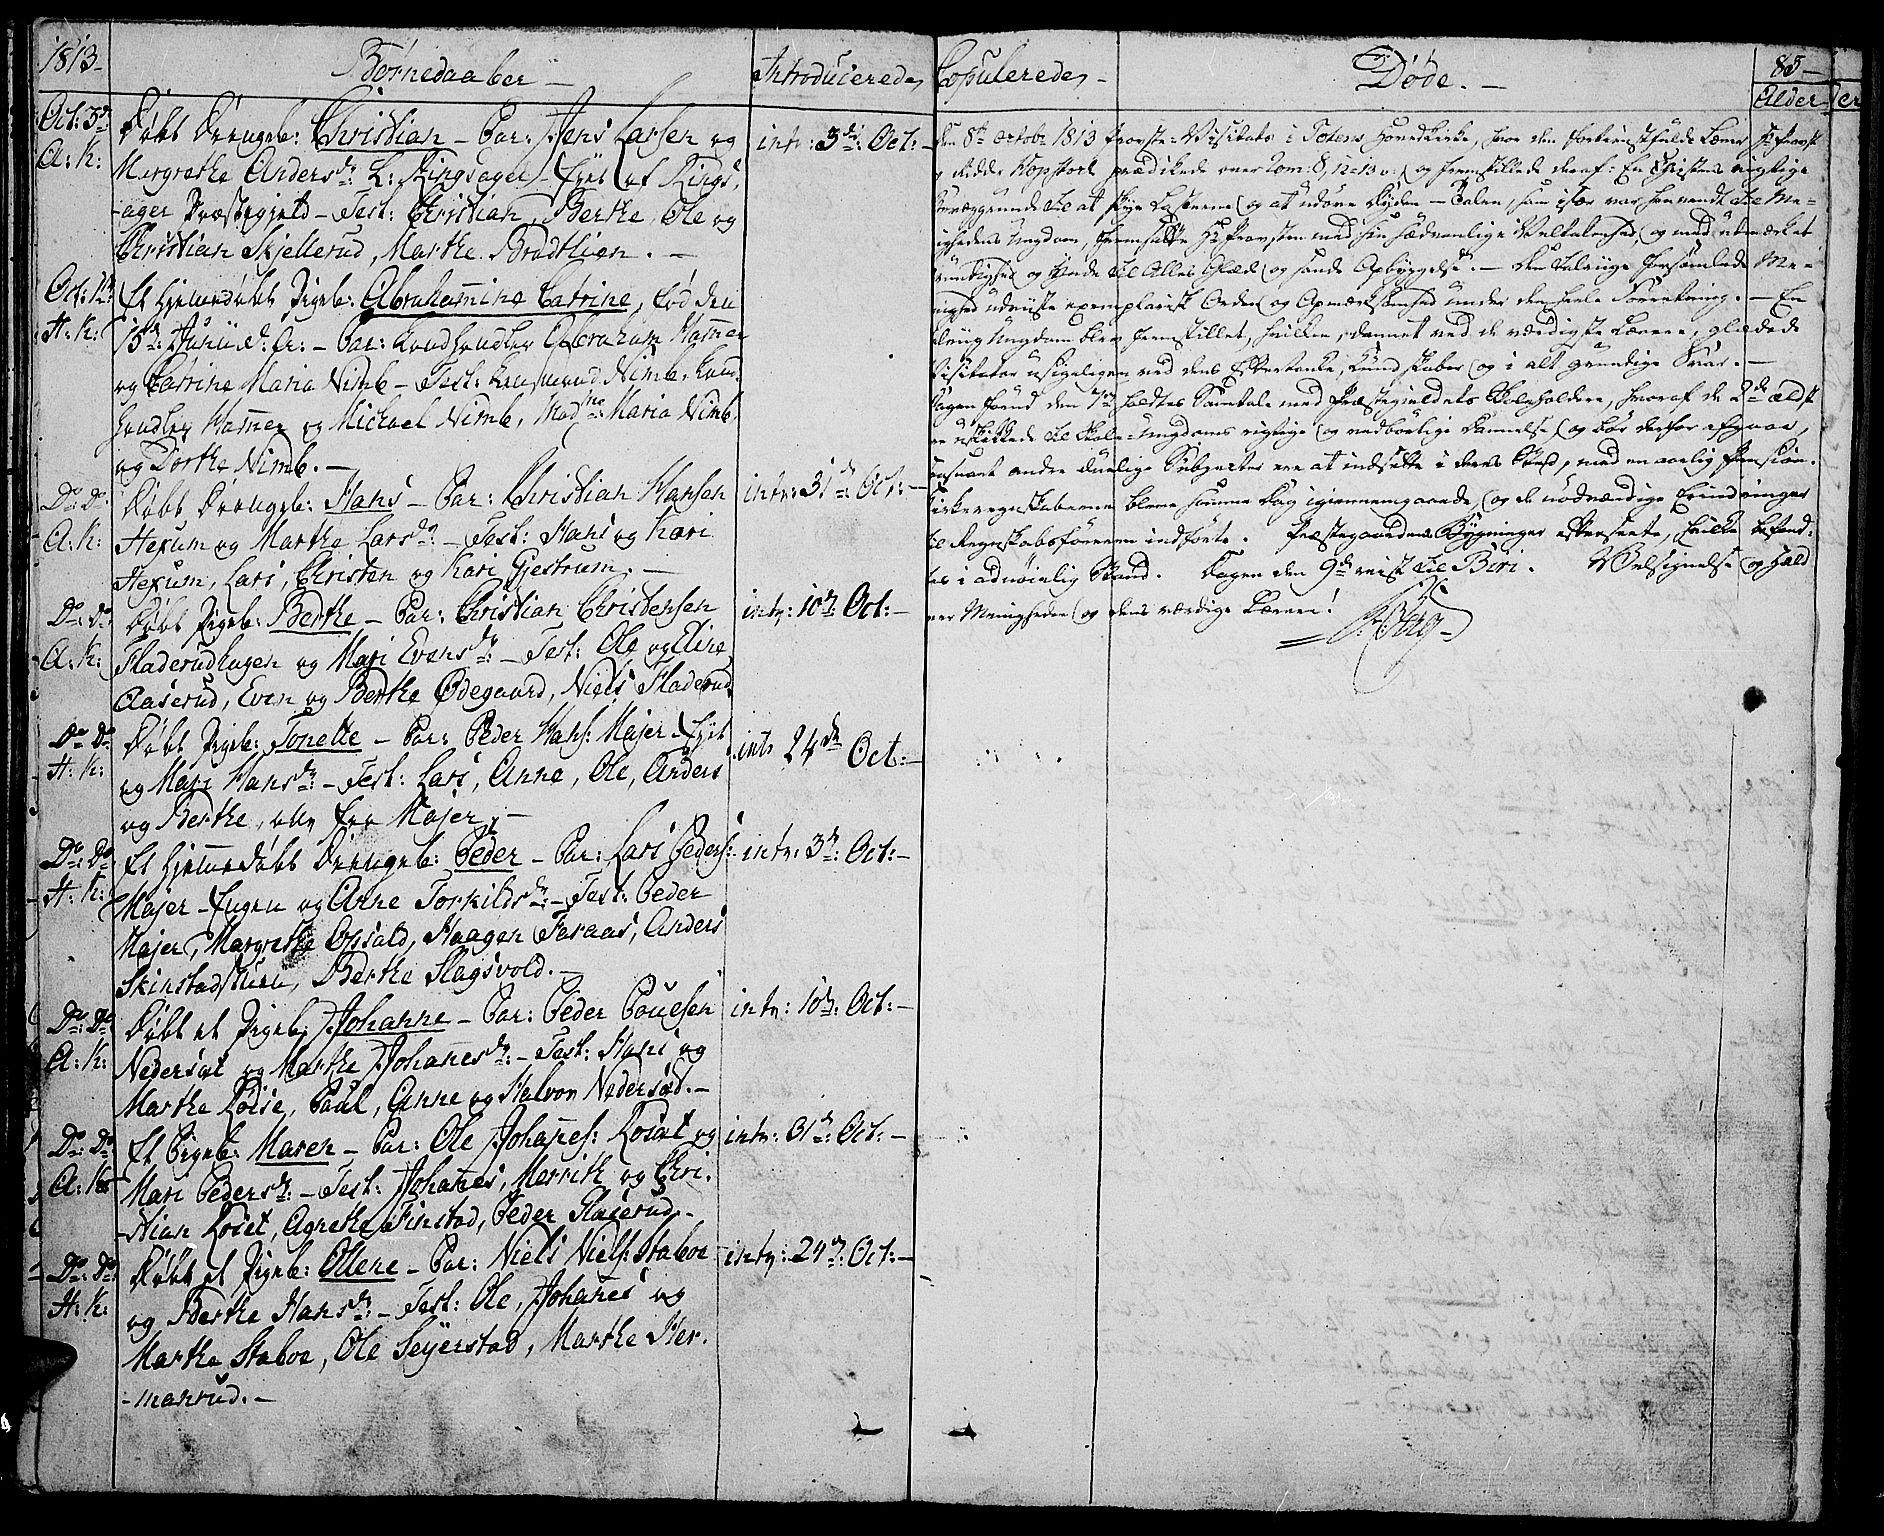 SAH, Toten prestekontor, Ministerialbok nr. 8, 1809-1814, s. 83